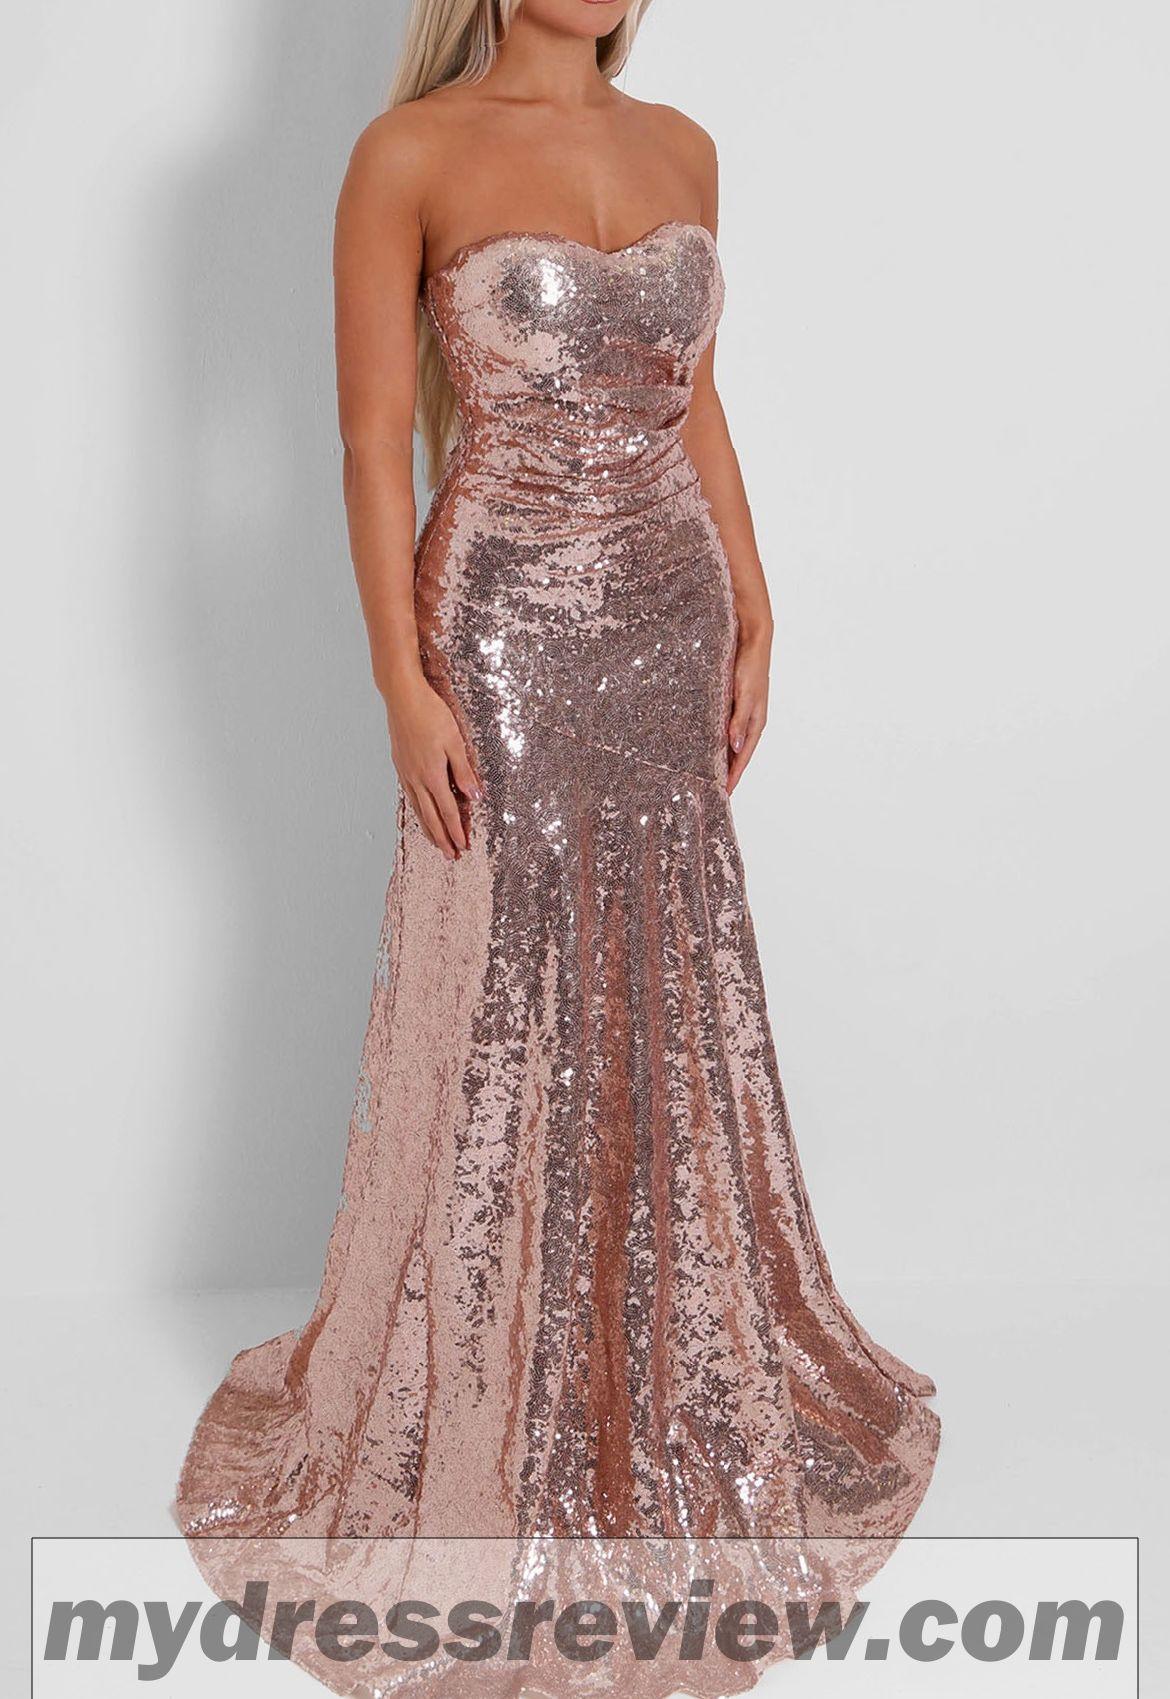 606373fedf Strapless Sequin Maxi Dress   Always In Vogue 2017 - MyDressReview